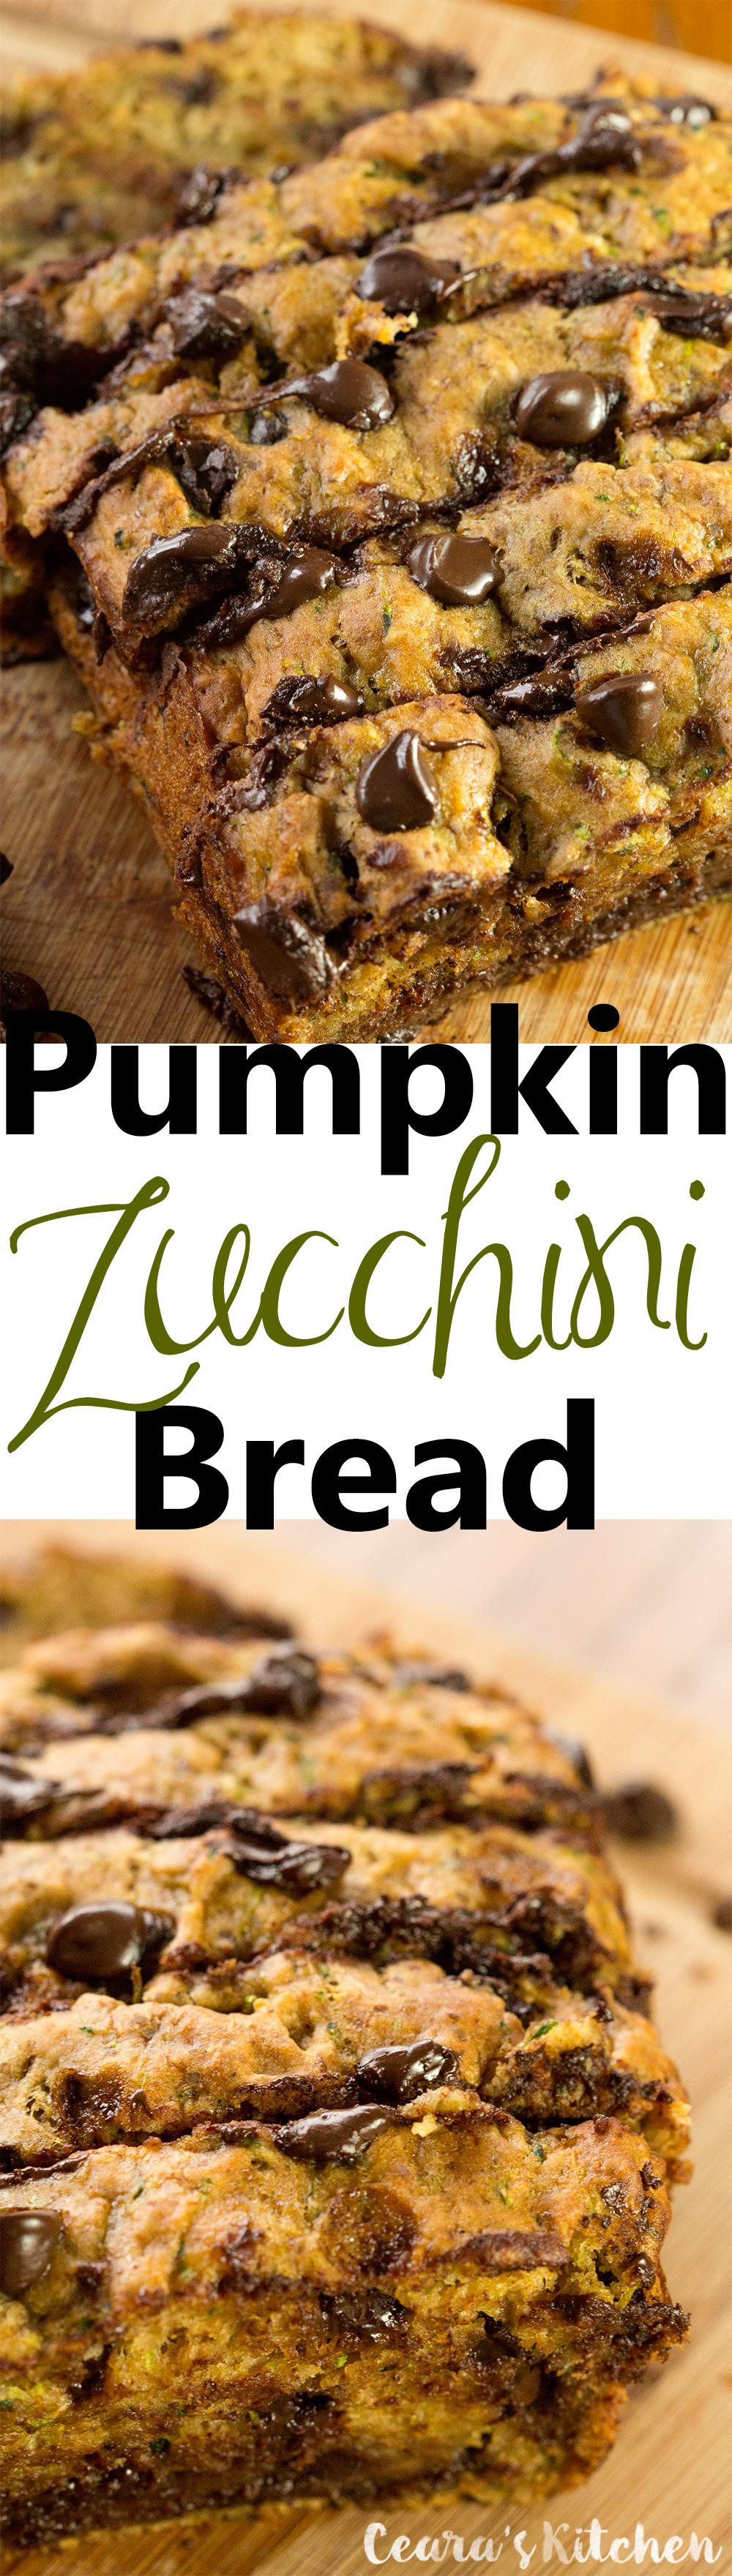 Vegan Healthy Chocolate Chip Pumpkin Bread recipe